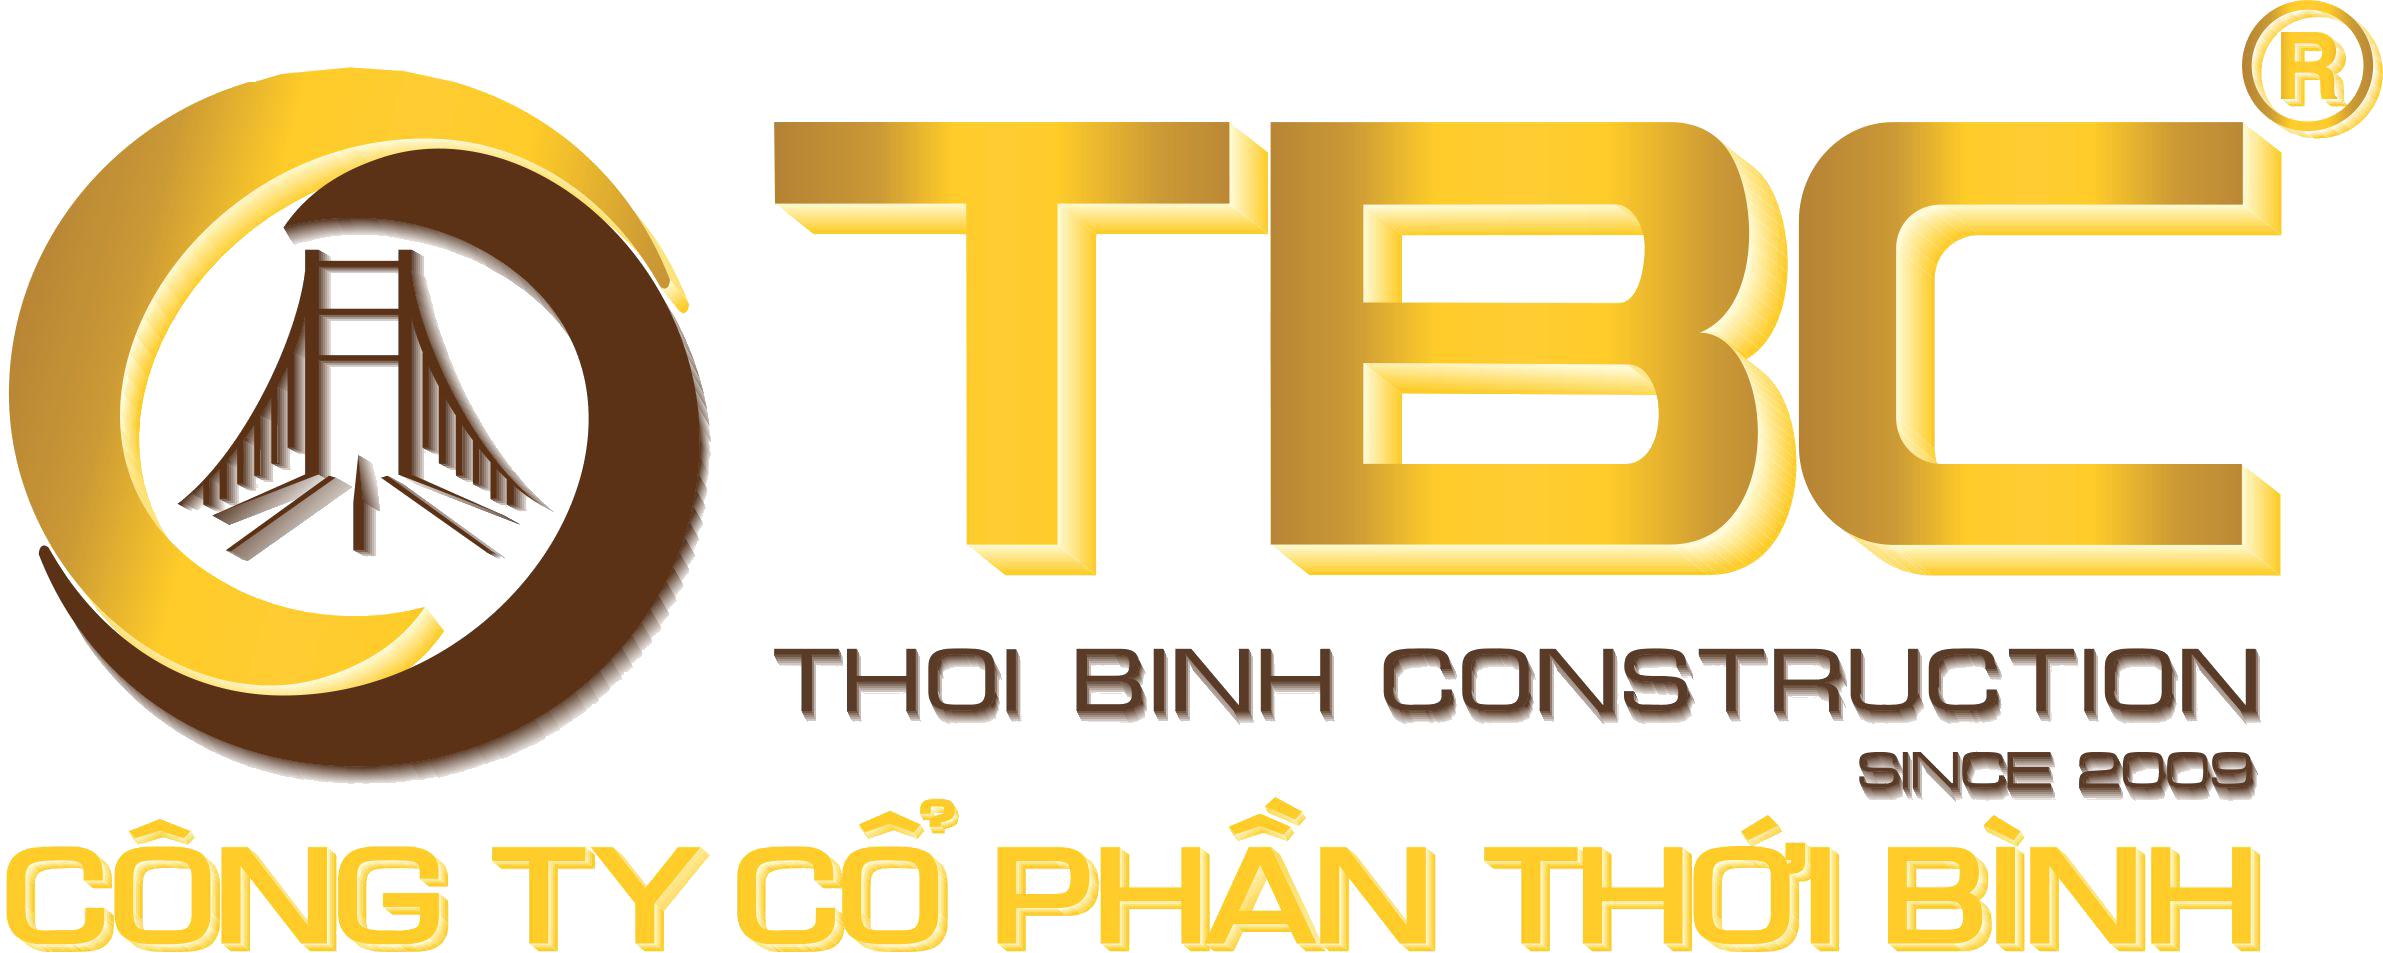 Thoi Binh Construction